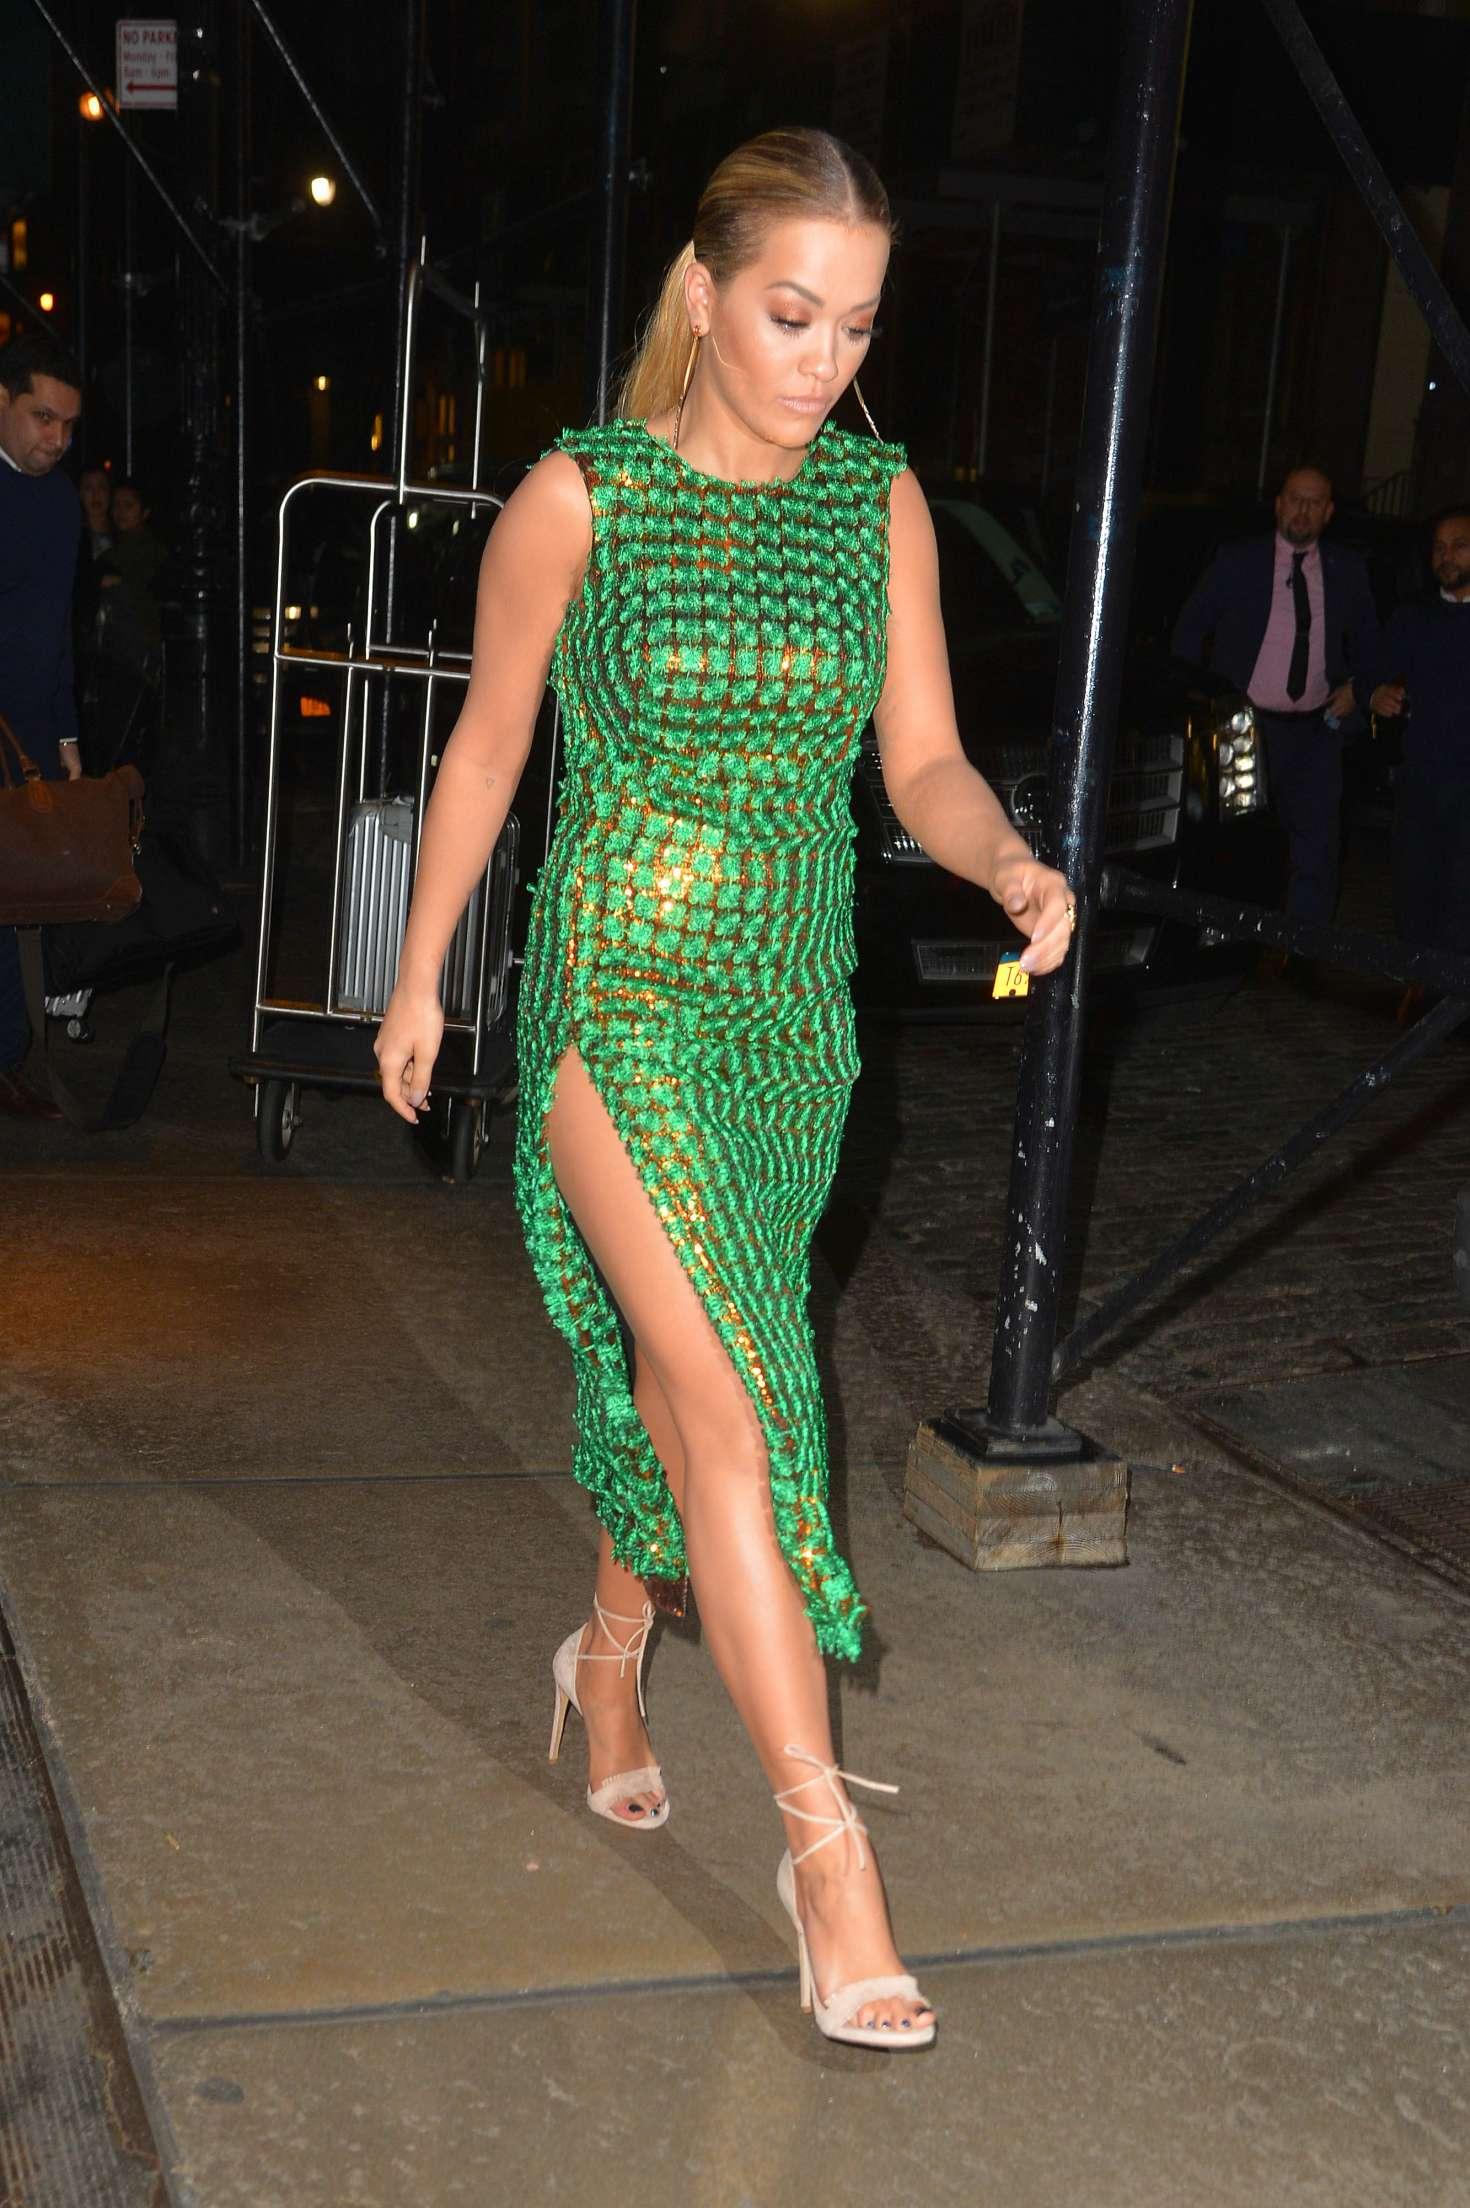 Rita Ora in tight green dress -04 - GotCeleb